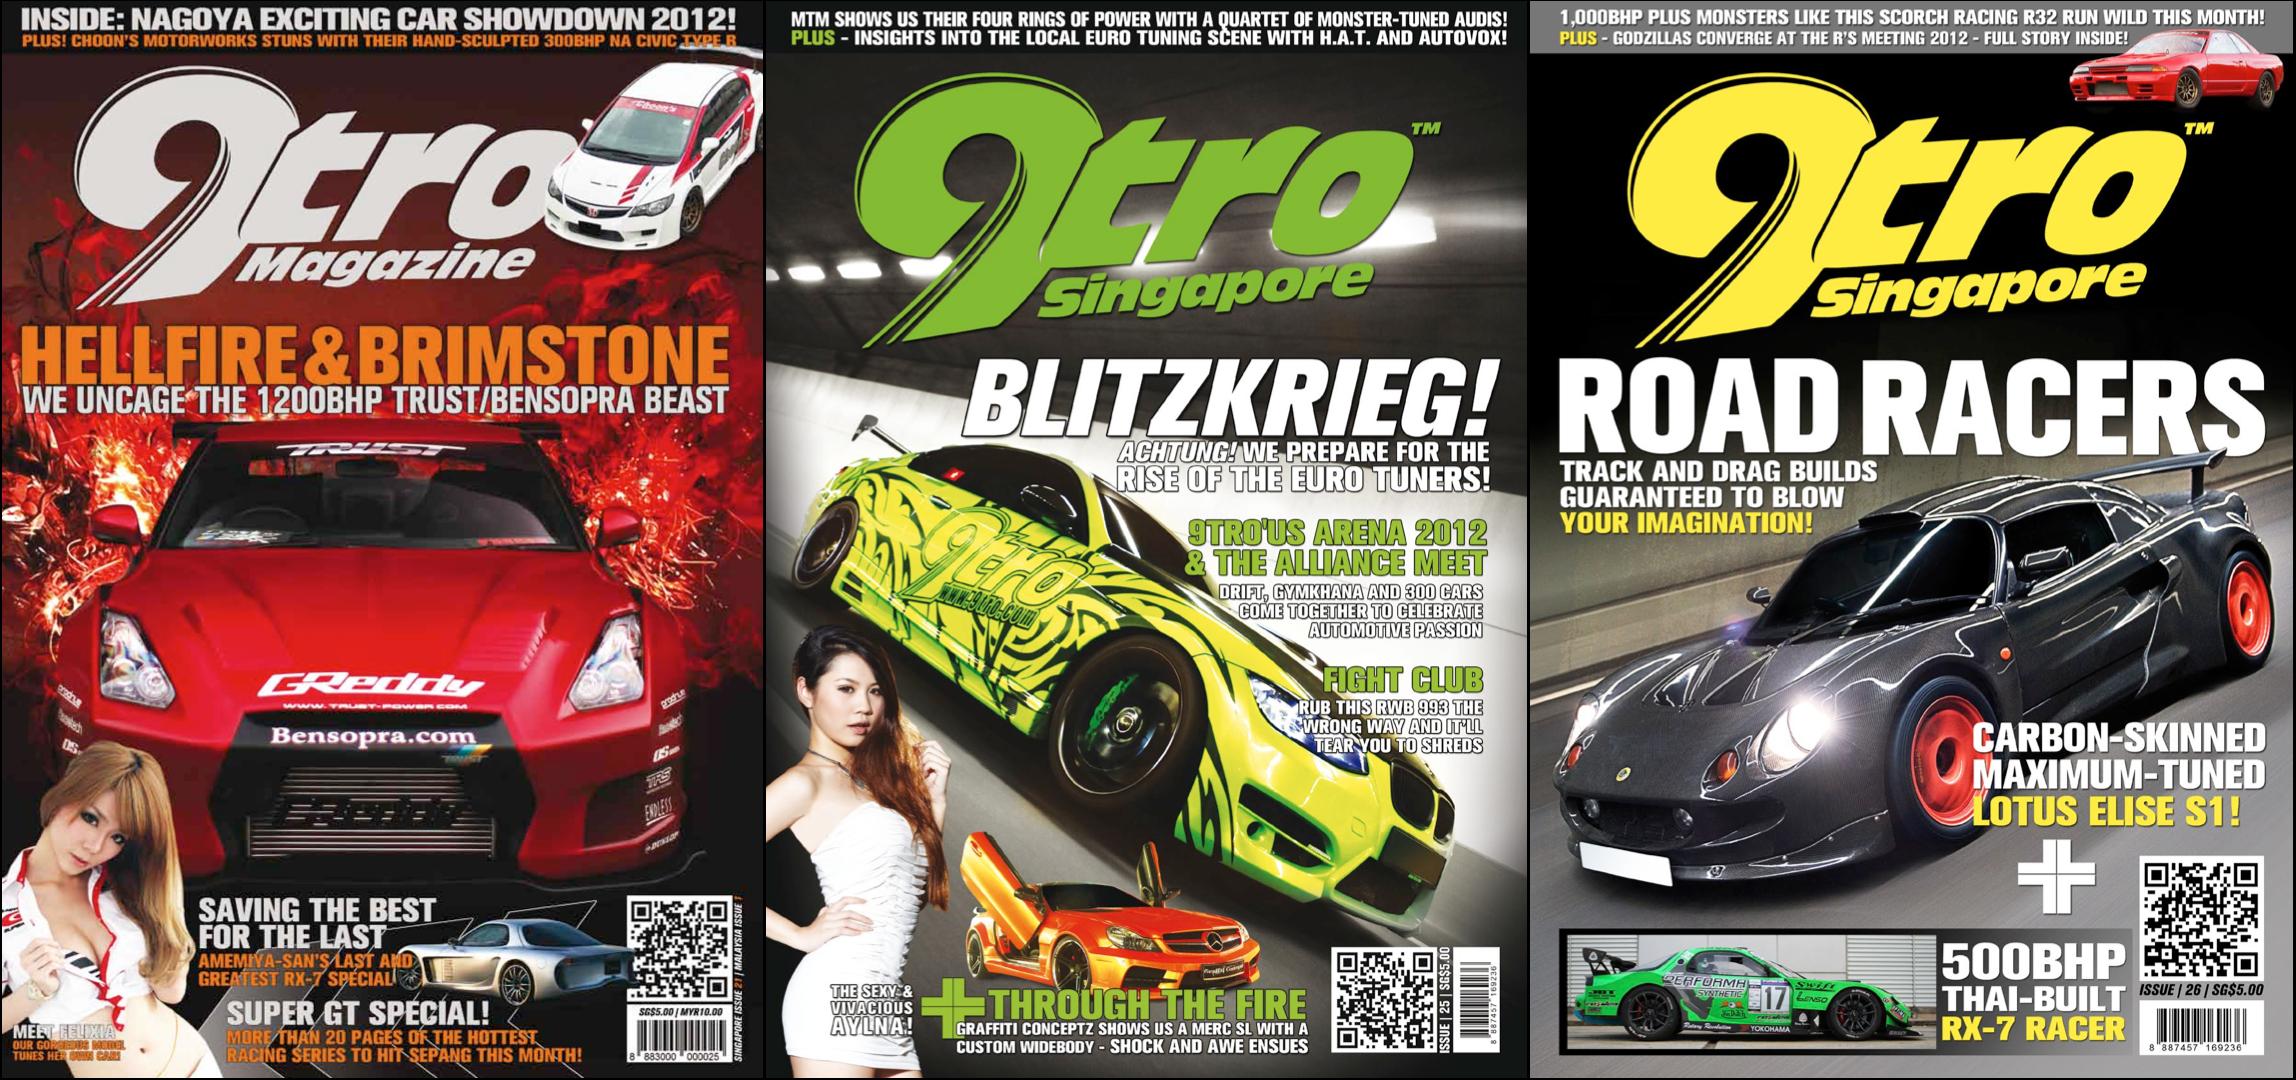 9tro Magazine Cover.jpg